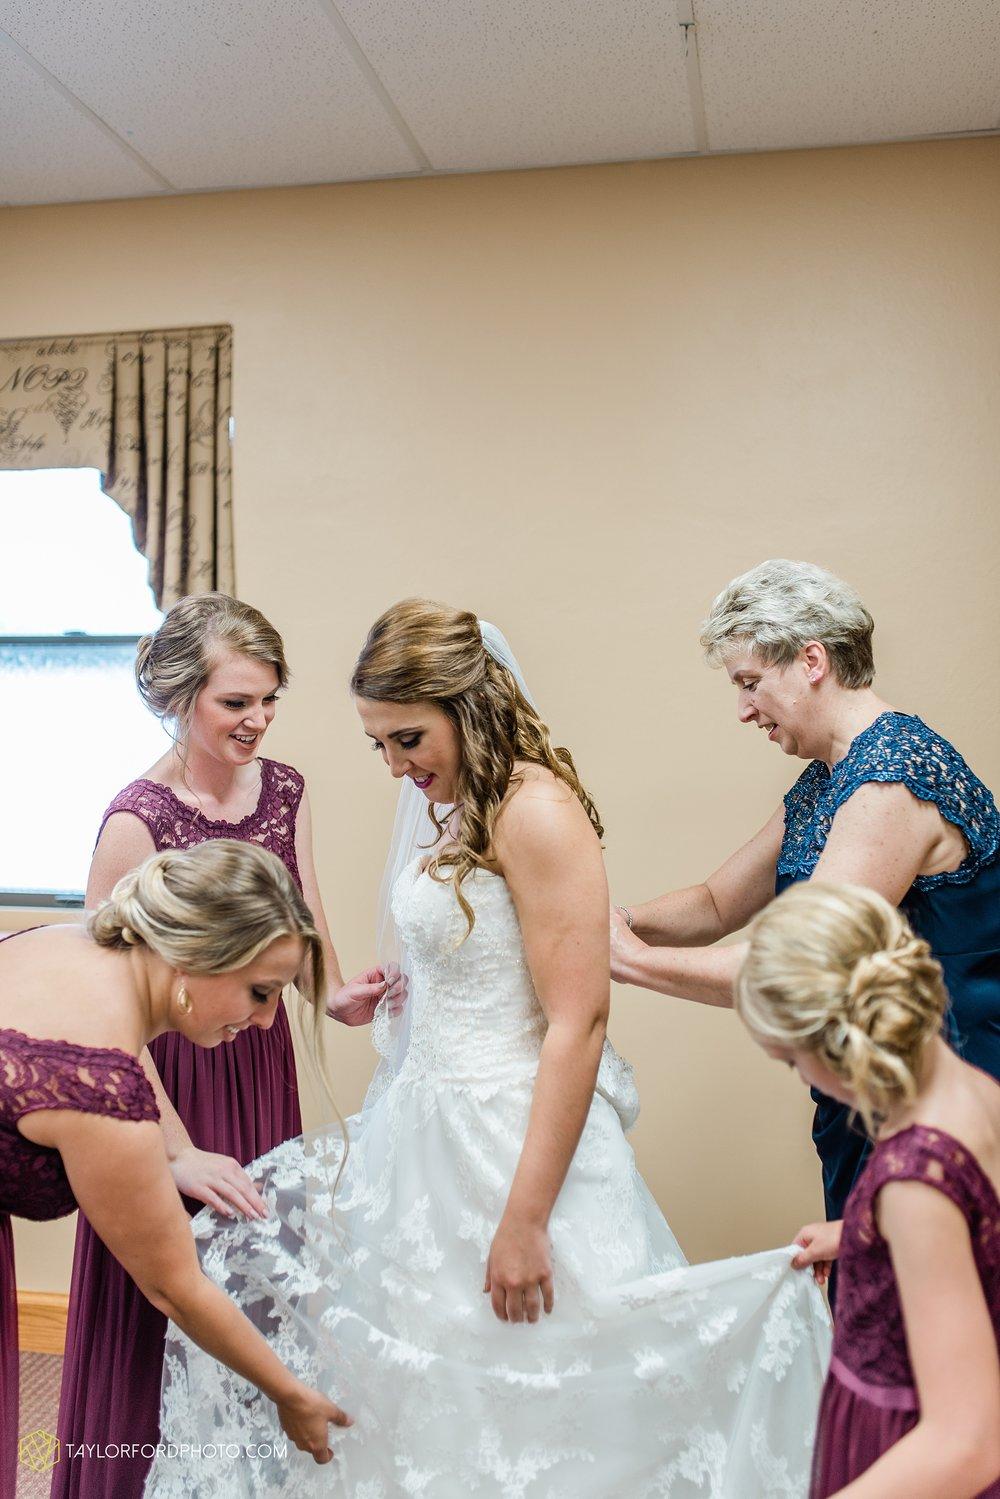 chelsey-zosh-jackson-young-first-united-methodist-church-senior-center-van-wert-ohio-wedding-photographer-taylor-ford-photography_0053.jpg